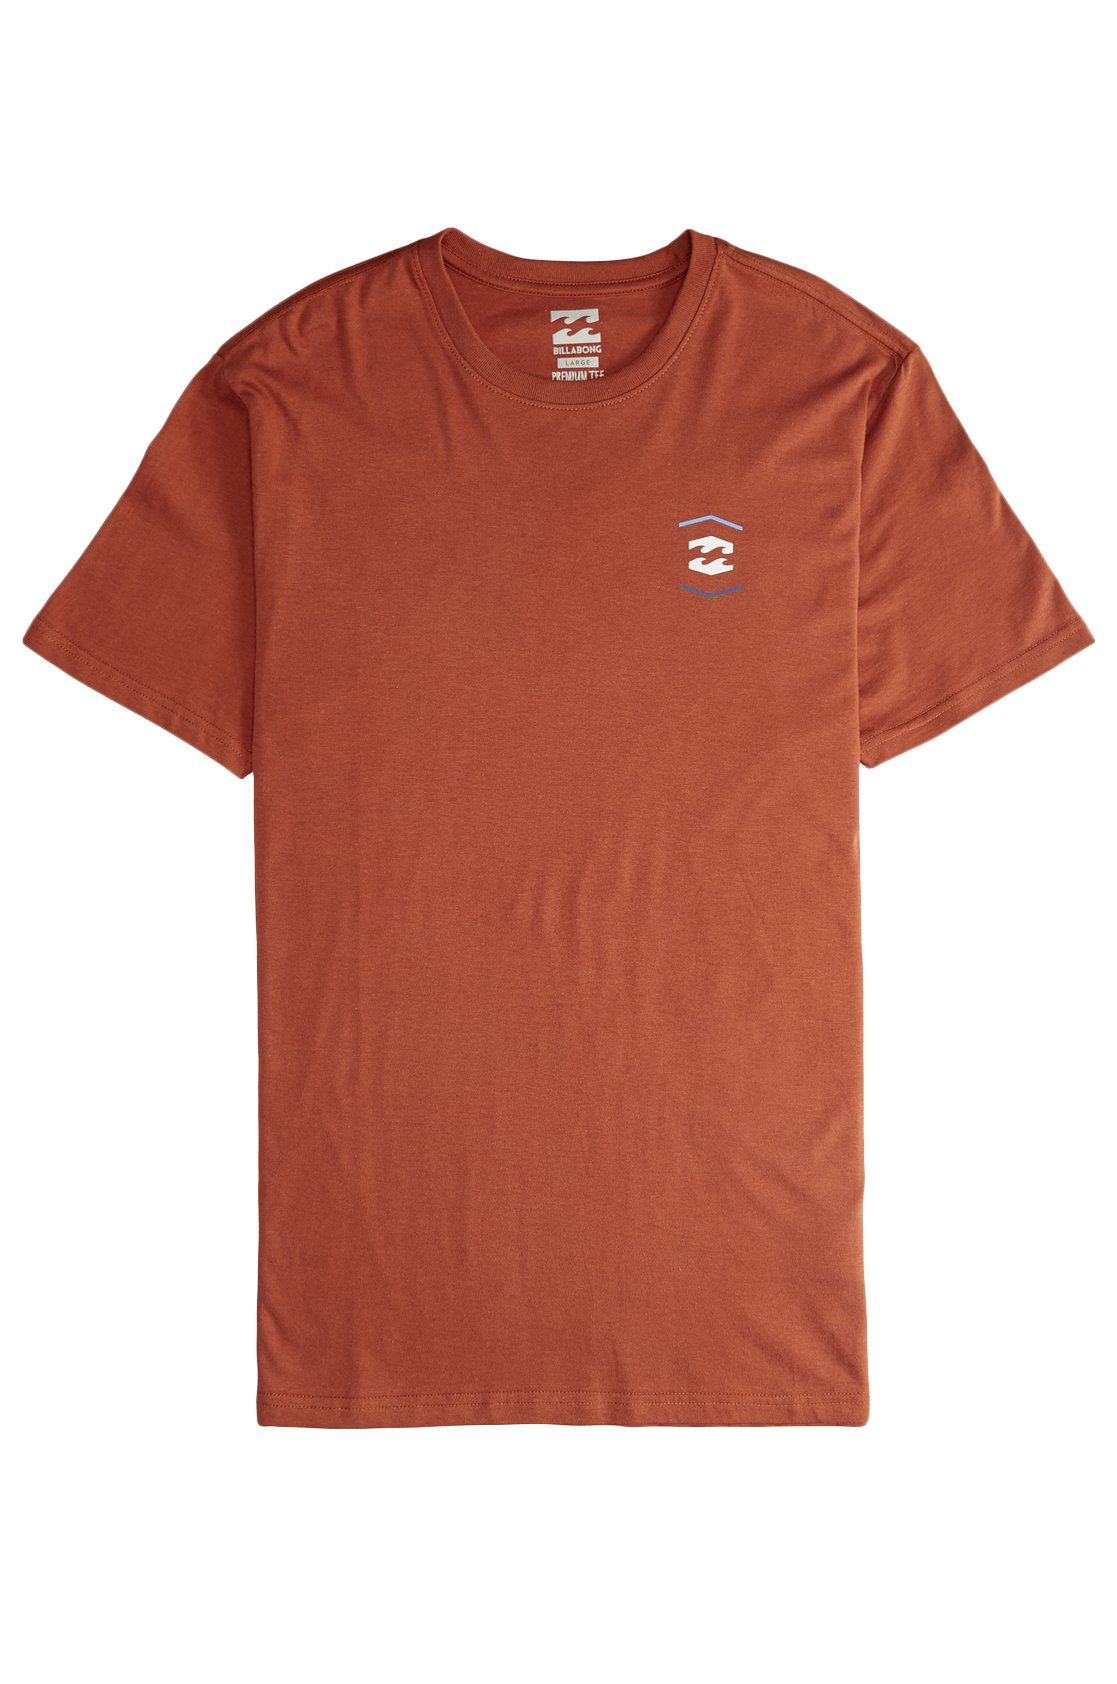 T-Shirt Billabong VISTA Sangria